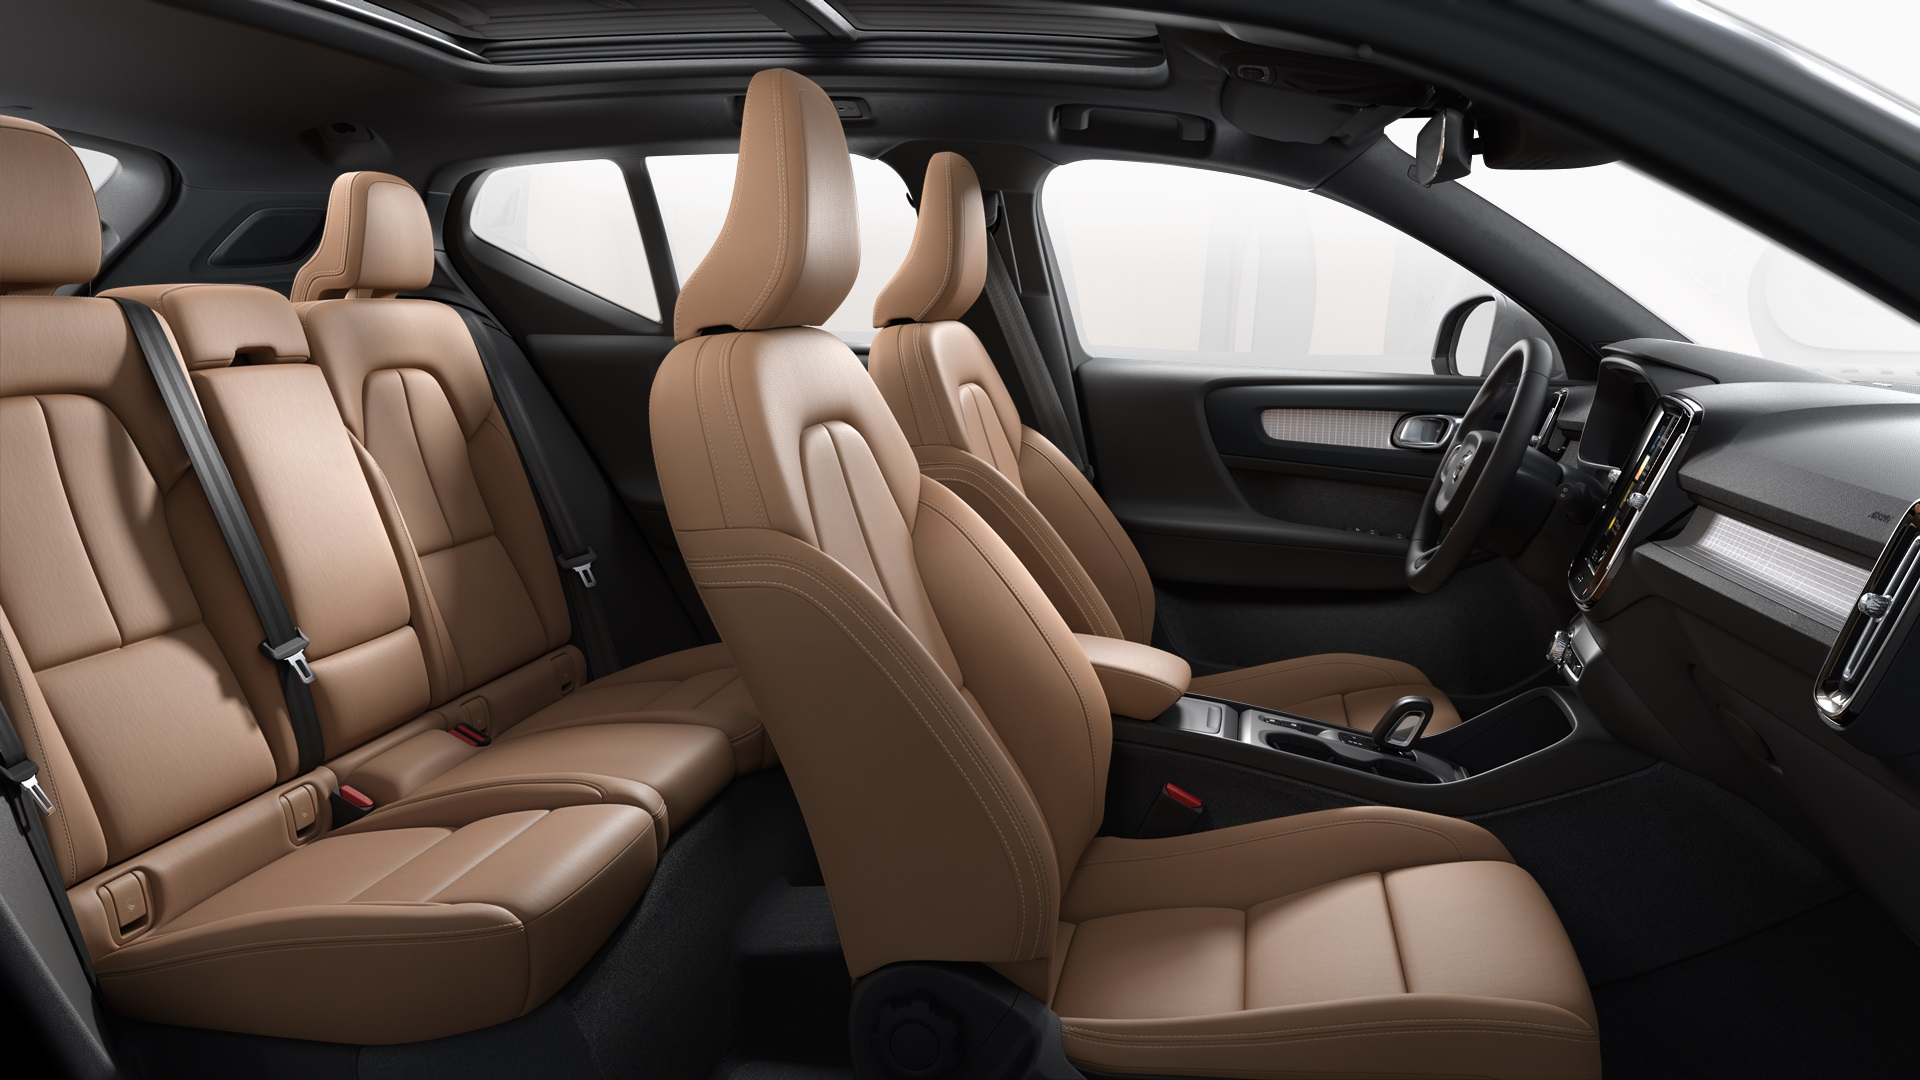 Volvo xc40 autobedrijf bluekens b v for Kaja horeca interieur b v